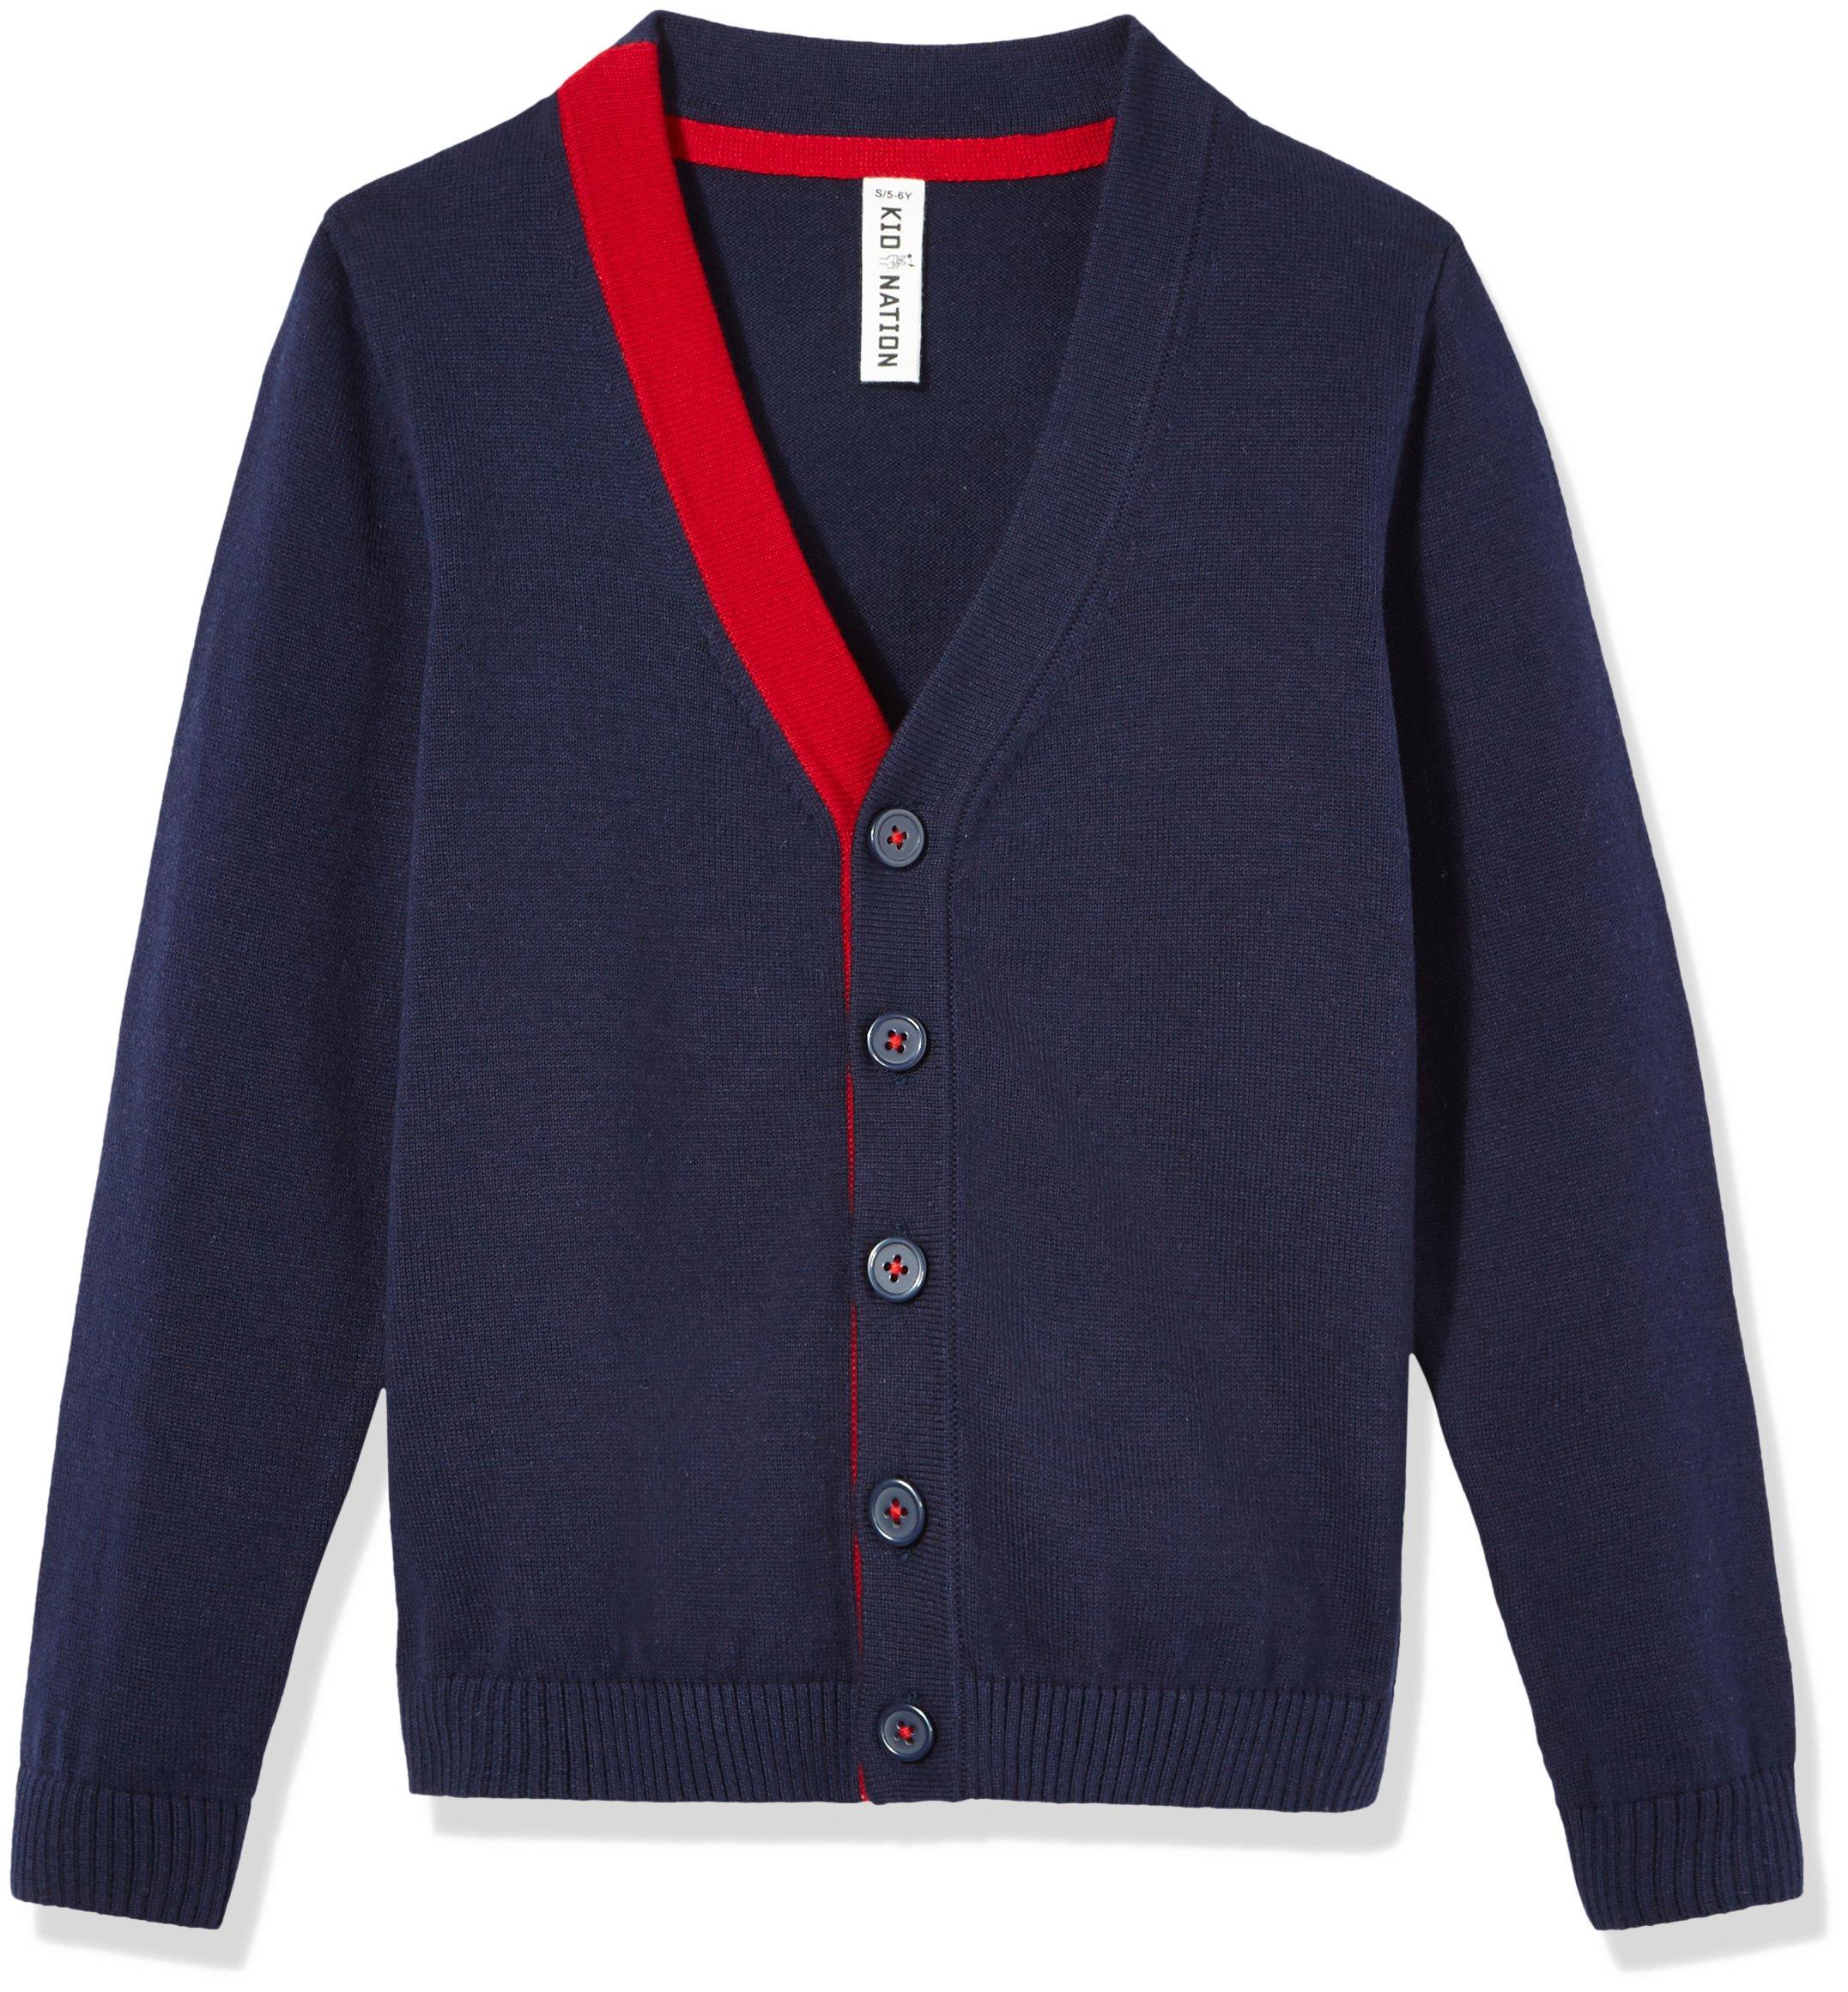 Kid Nation Boys' Long Sleeve Cardigan Sweater M Navy